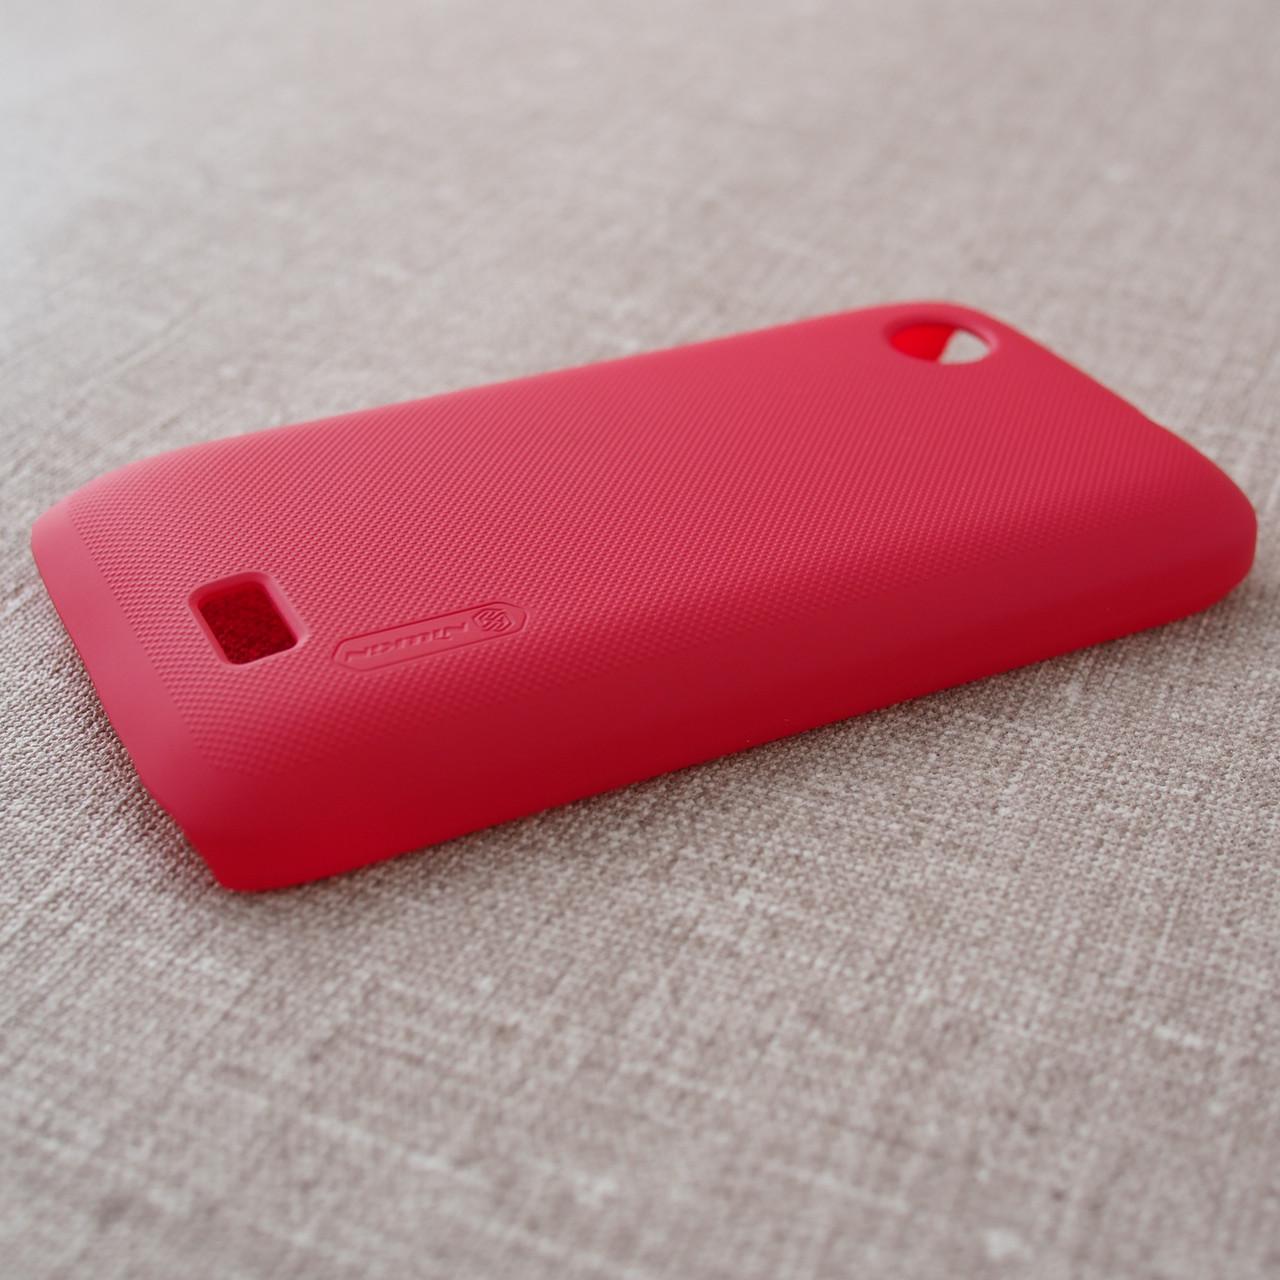 Чехлы для других смартфонов Nillkin Super Frosted Shield Lenovo A369 red